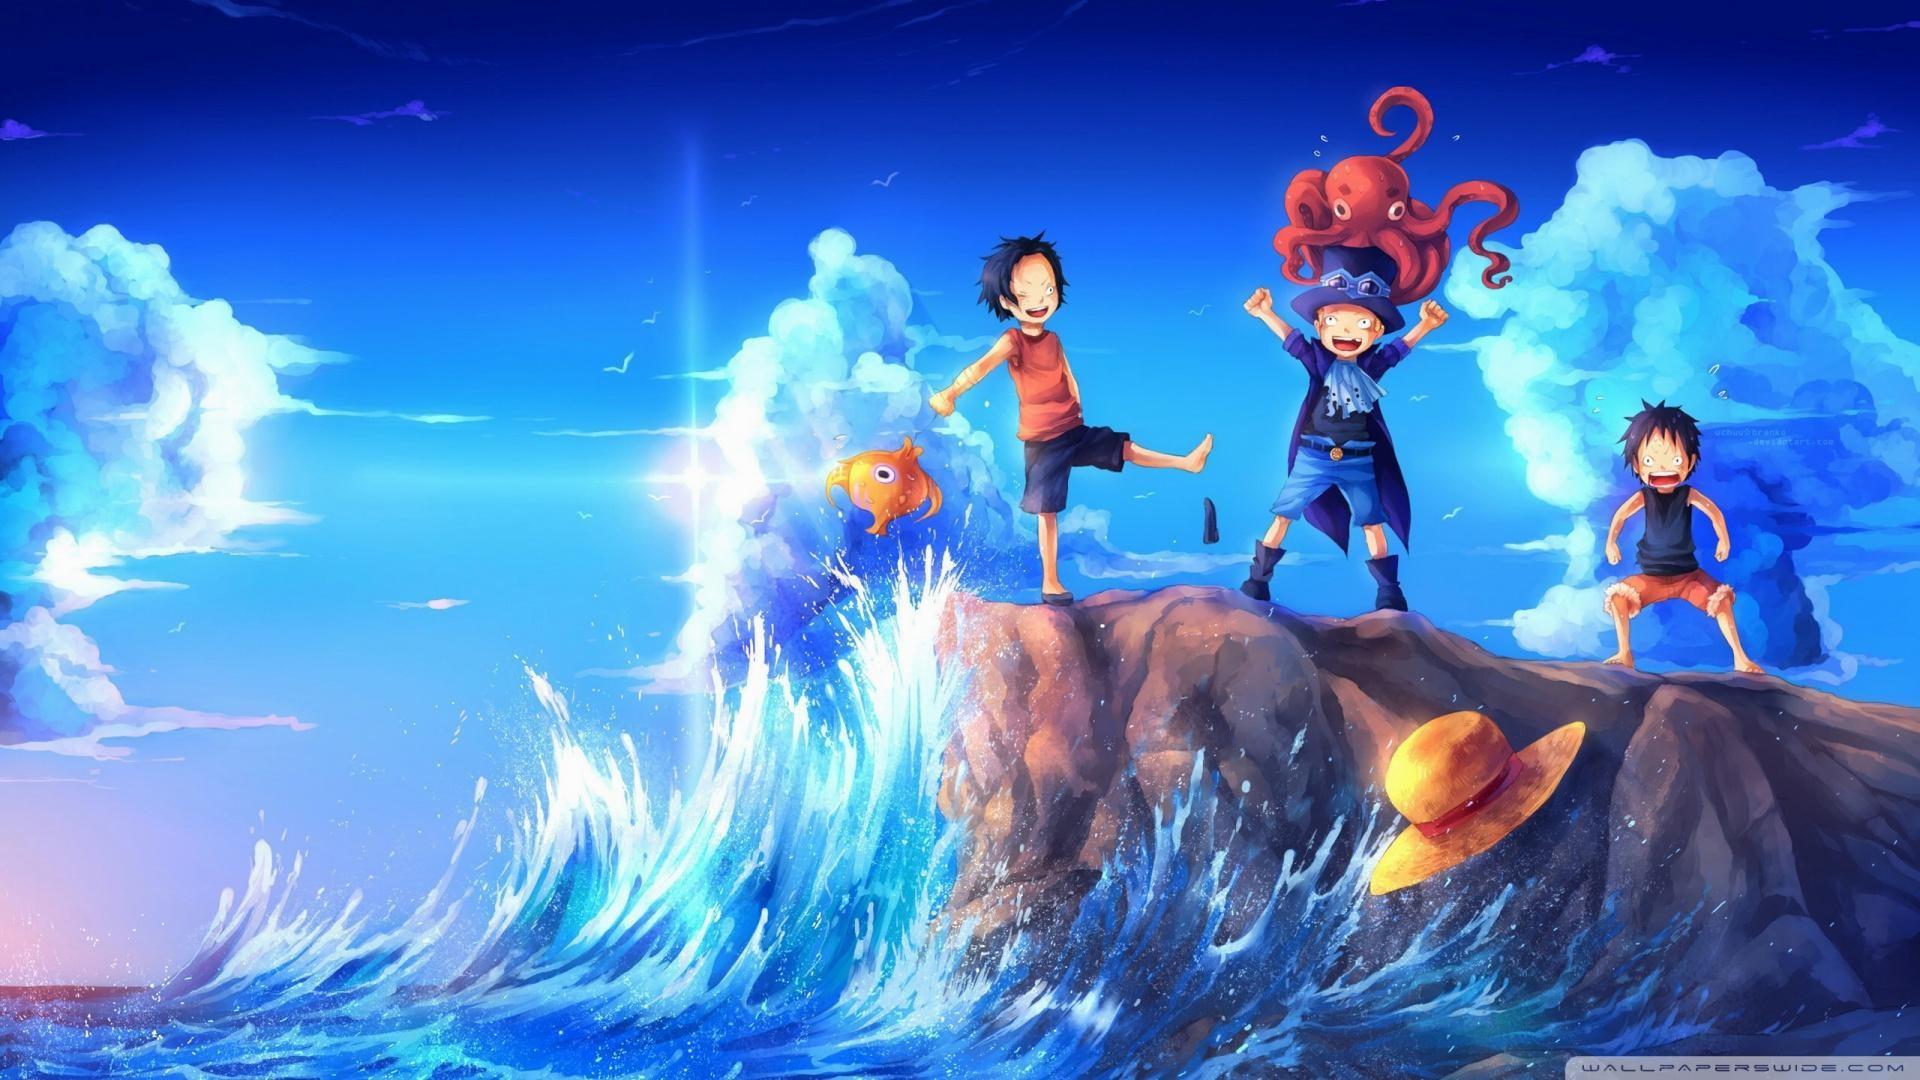 One-Piece-Art-Sabo-Portgas-D.Ace-Luffy-